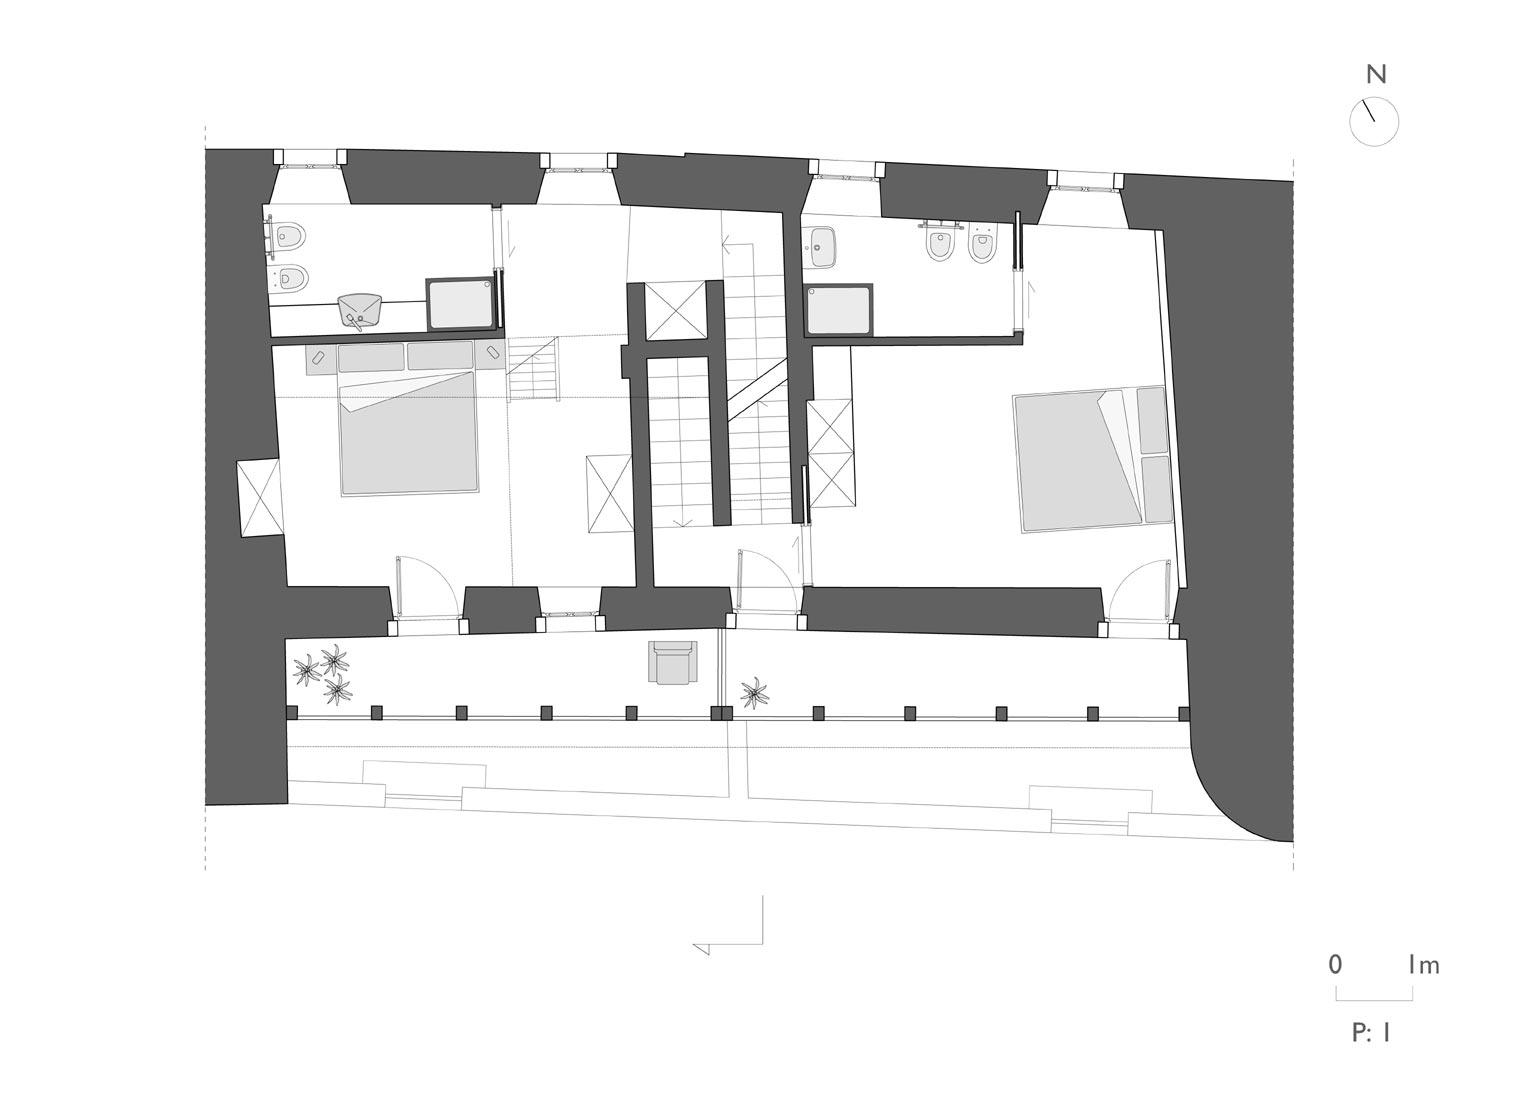 vk-architetti_romeo_juliet_plan1